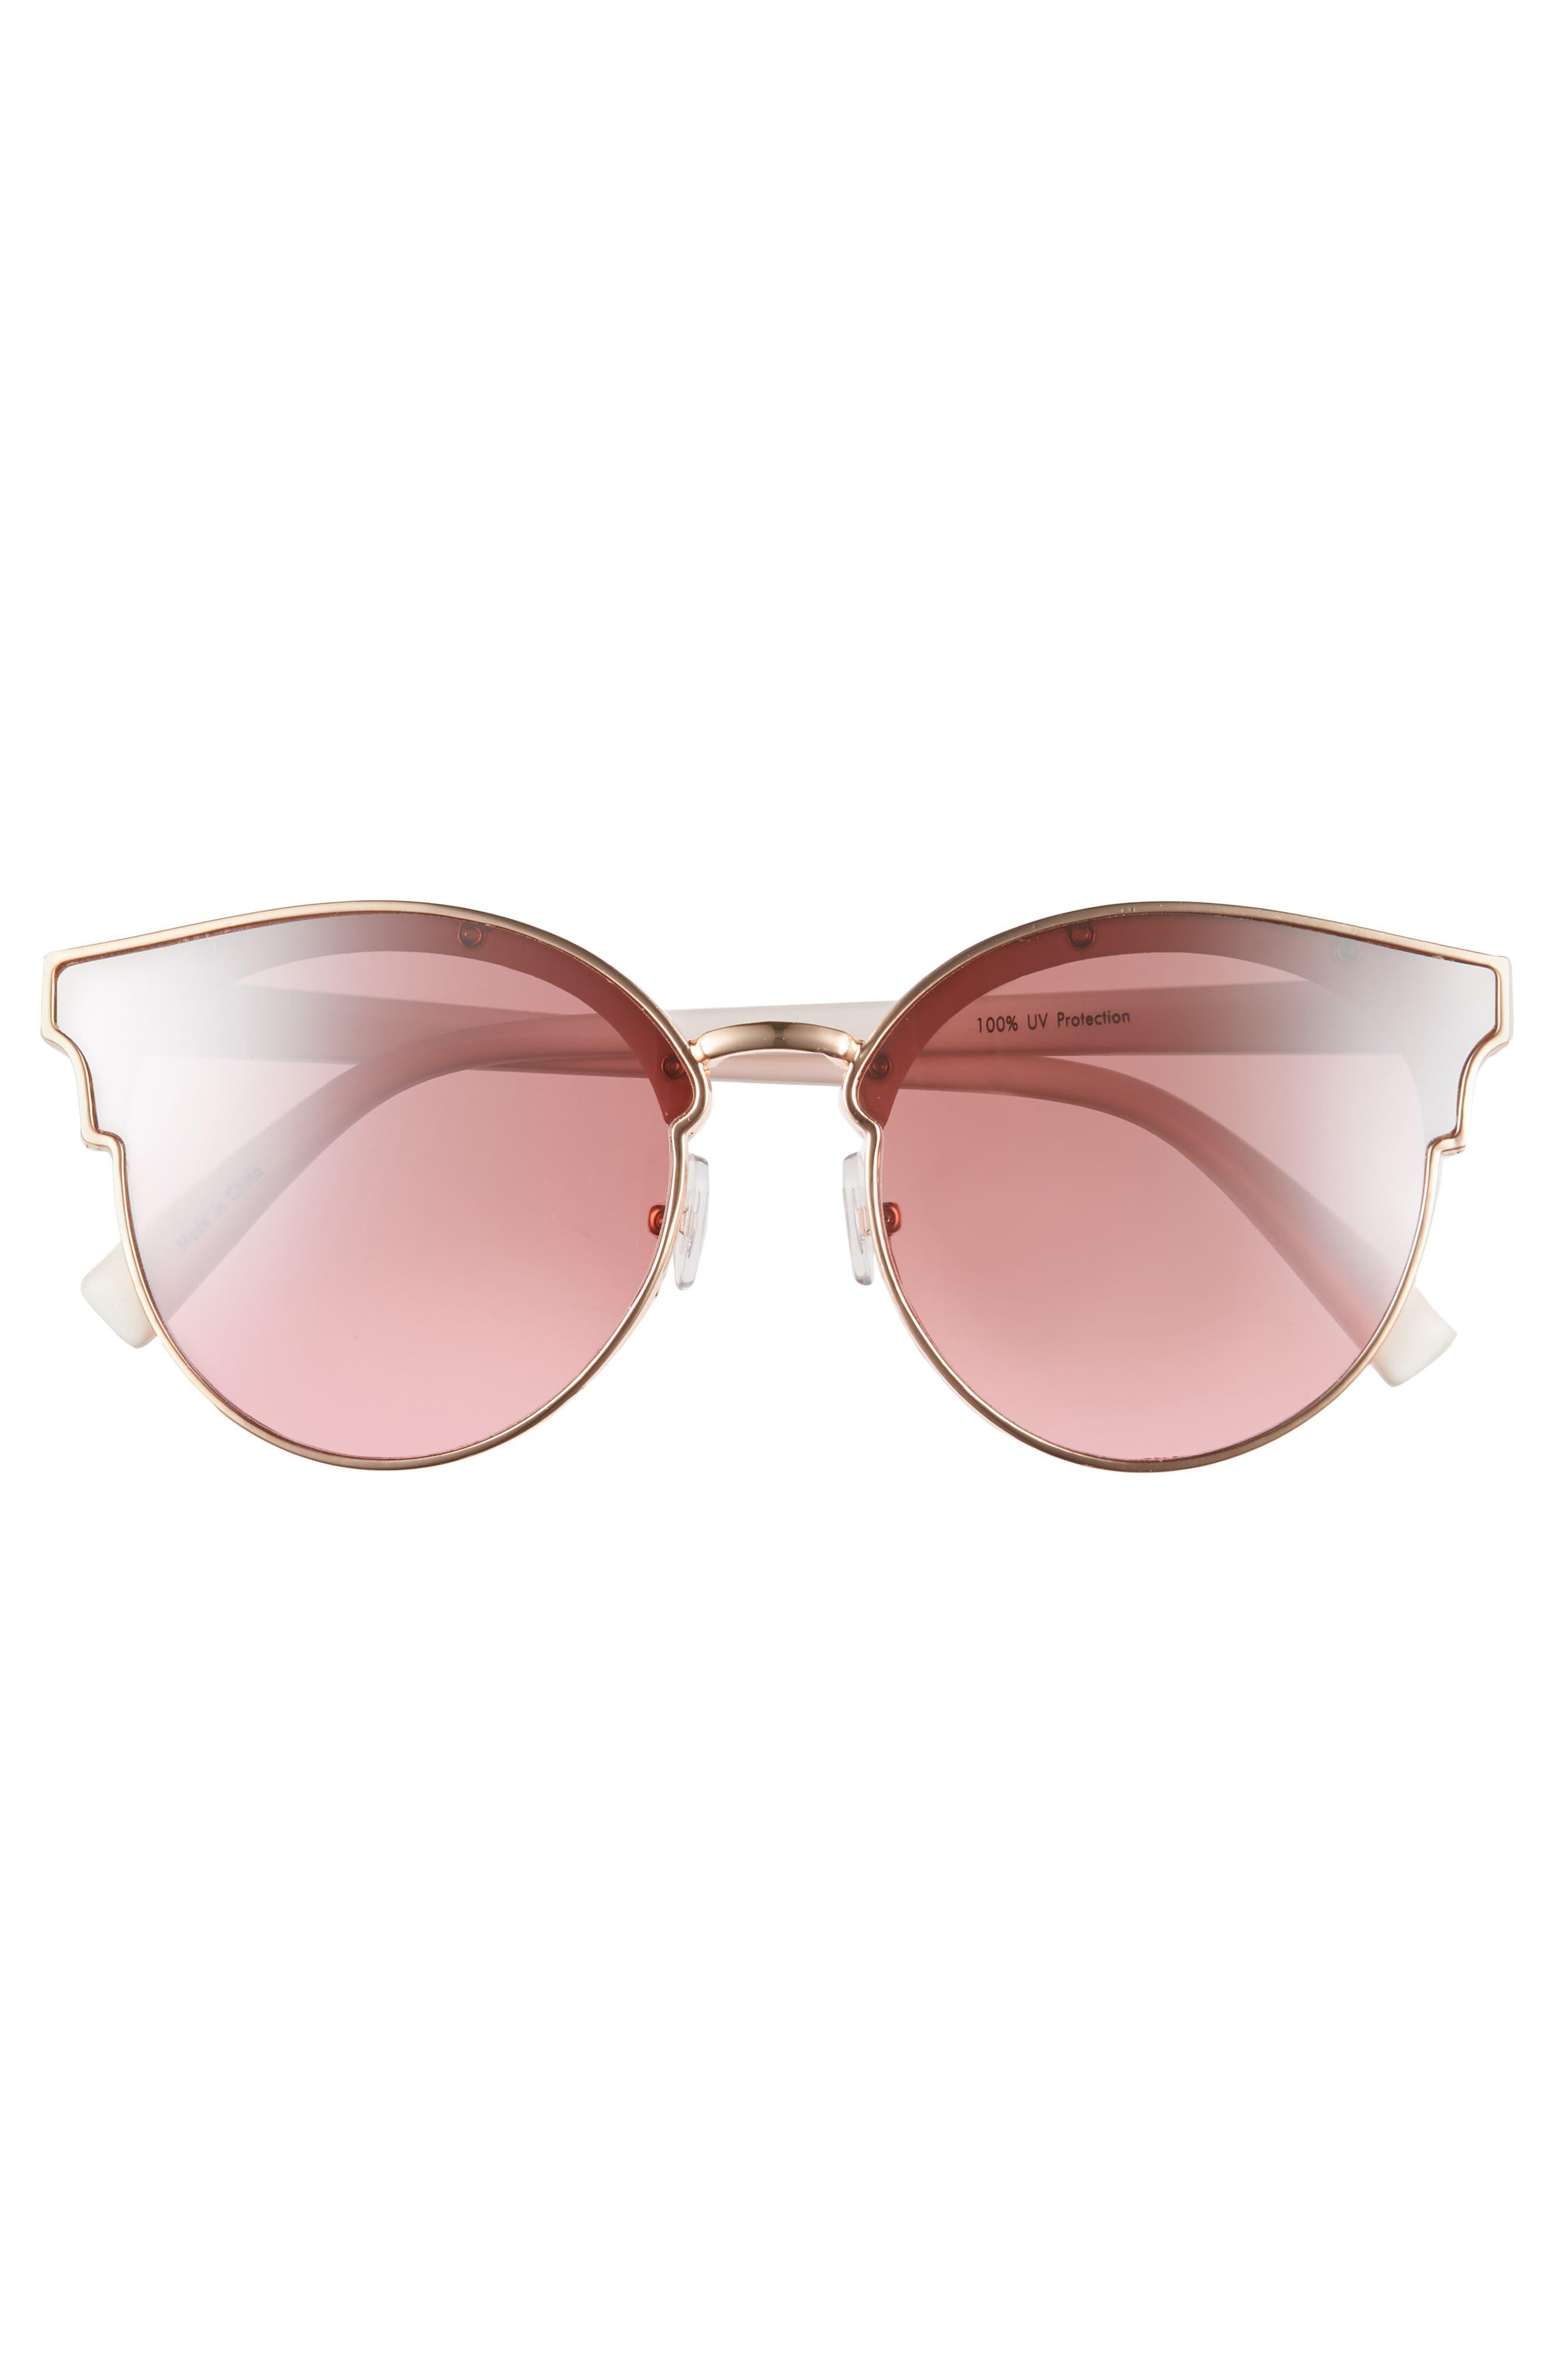 58mm Flat Cat Eye Sunglasses,                             Alternate thumbnail 3, color,